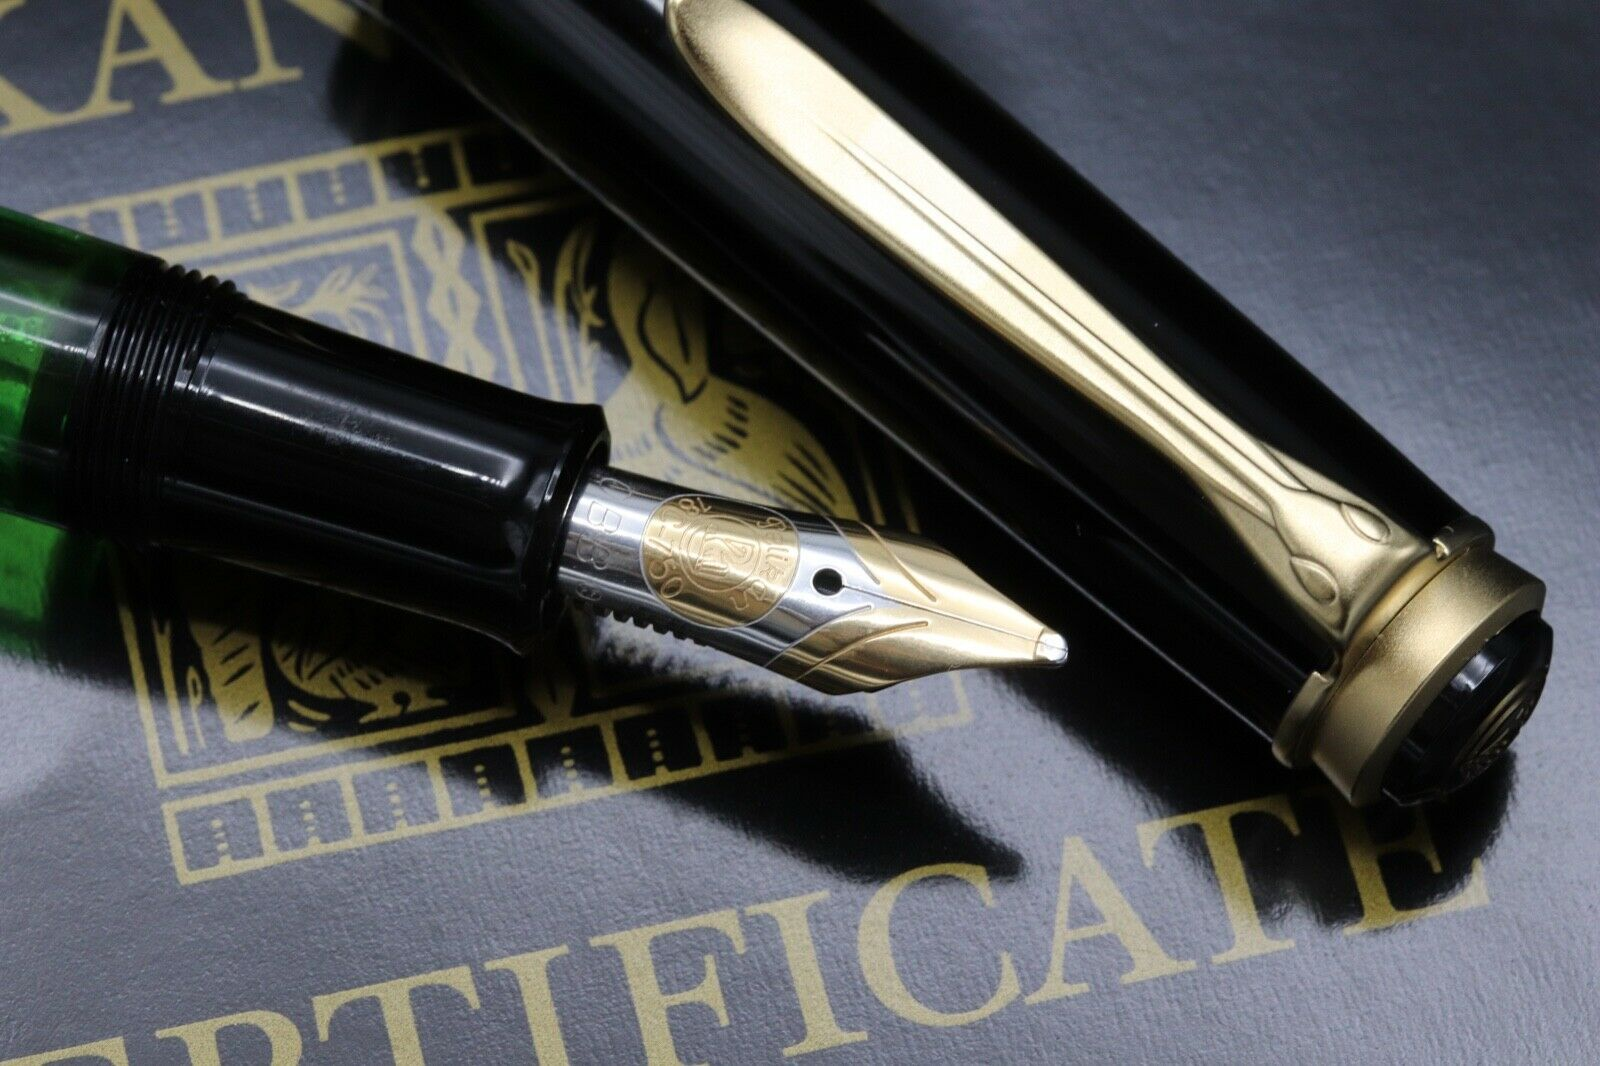 Pelikan M700 Toledo Fountain Pen - OBB PF Nib - UNUSED - W.Germany 2